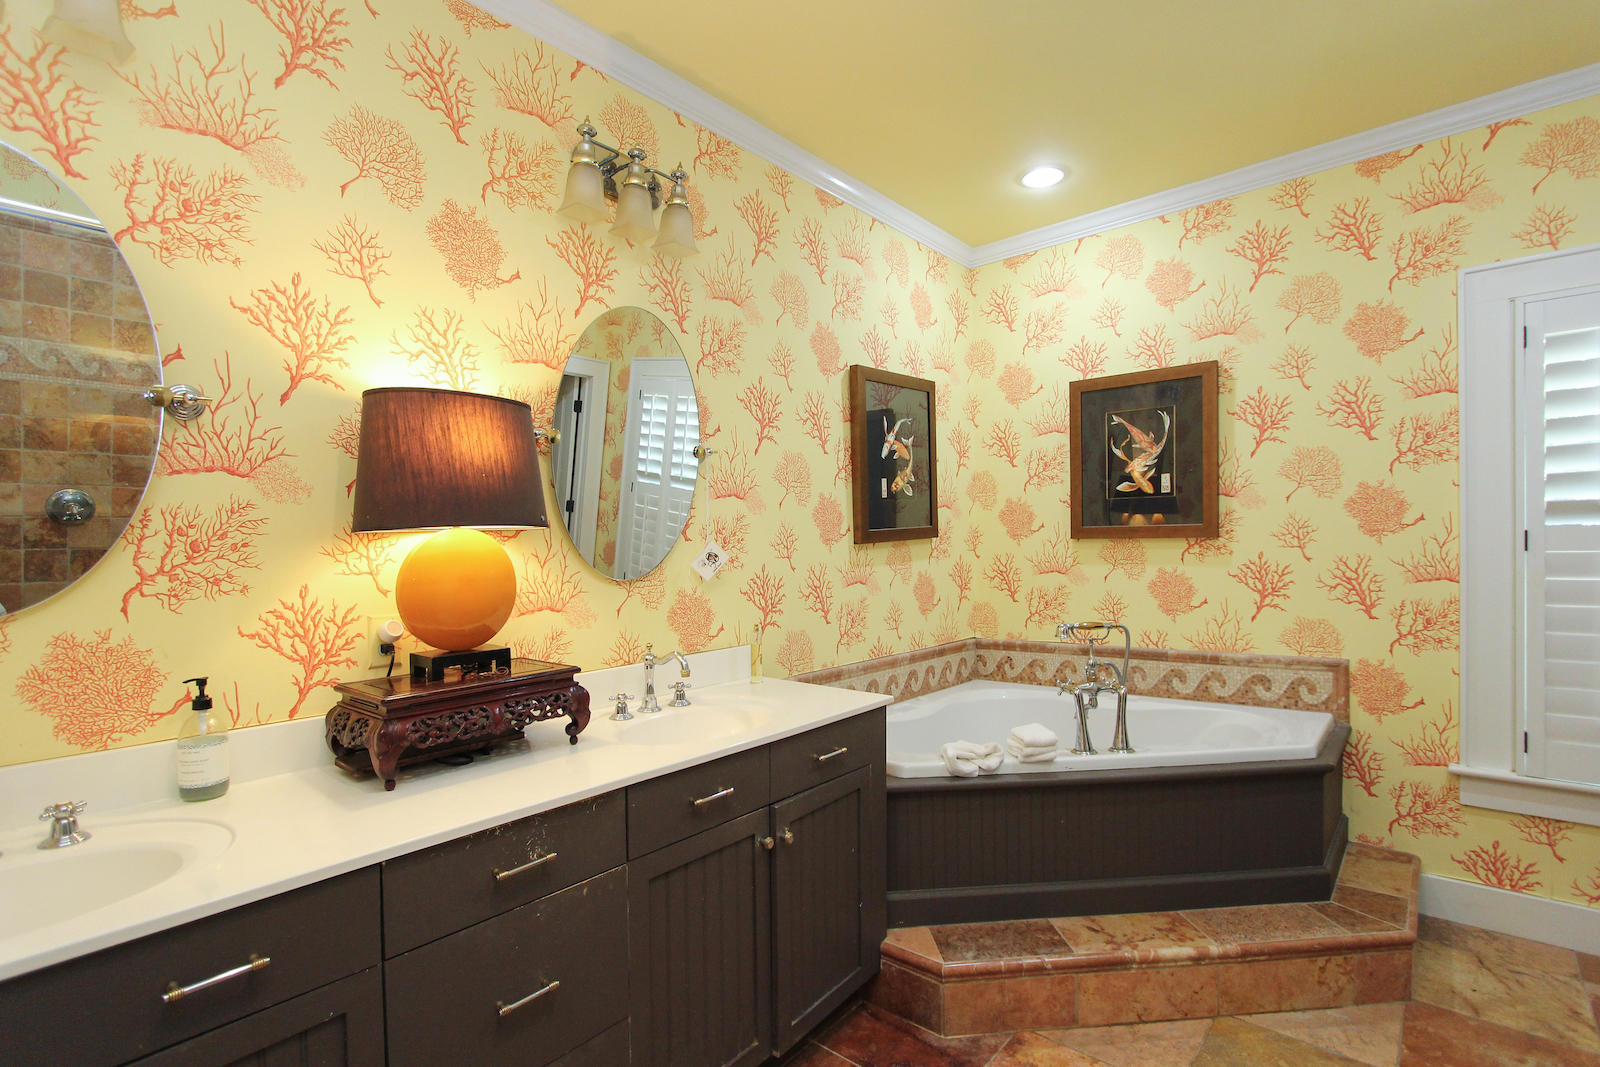 Albemarle Point Homes For Sale - 3 Albemarle, Charleston, SC - 14